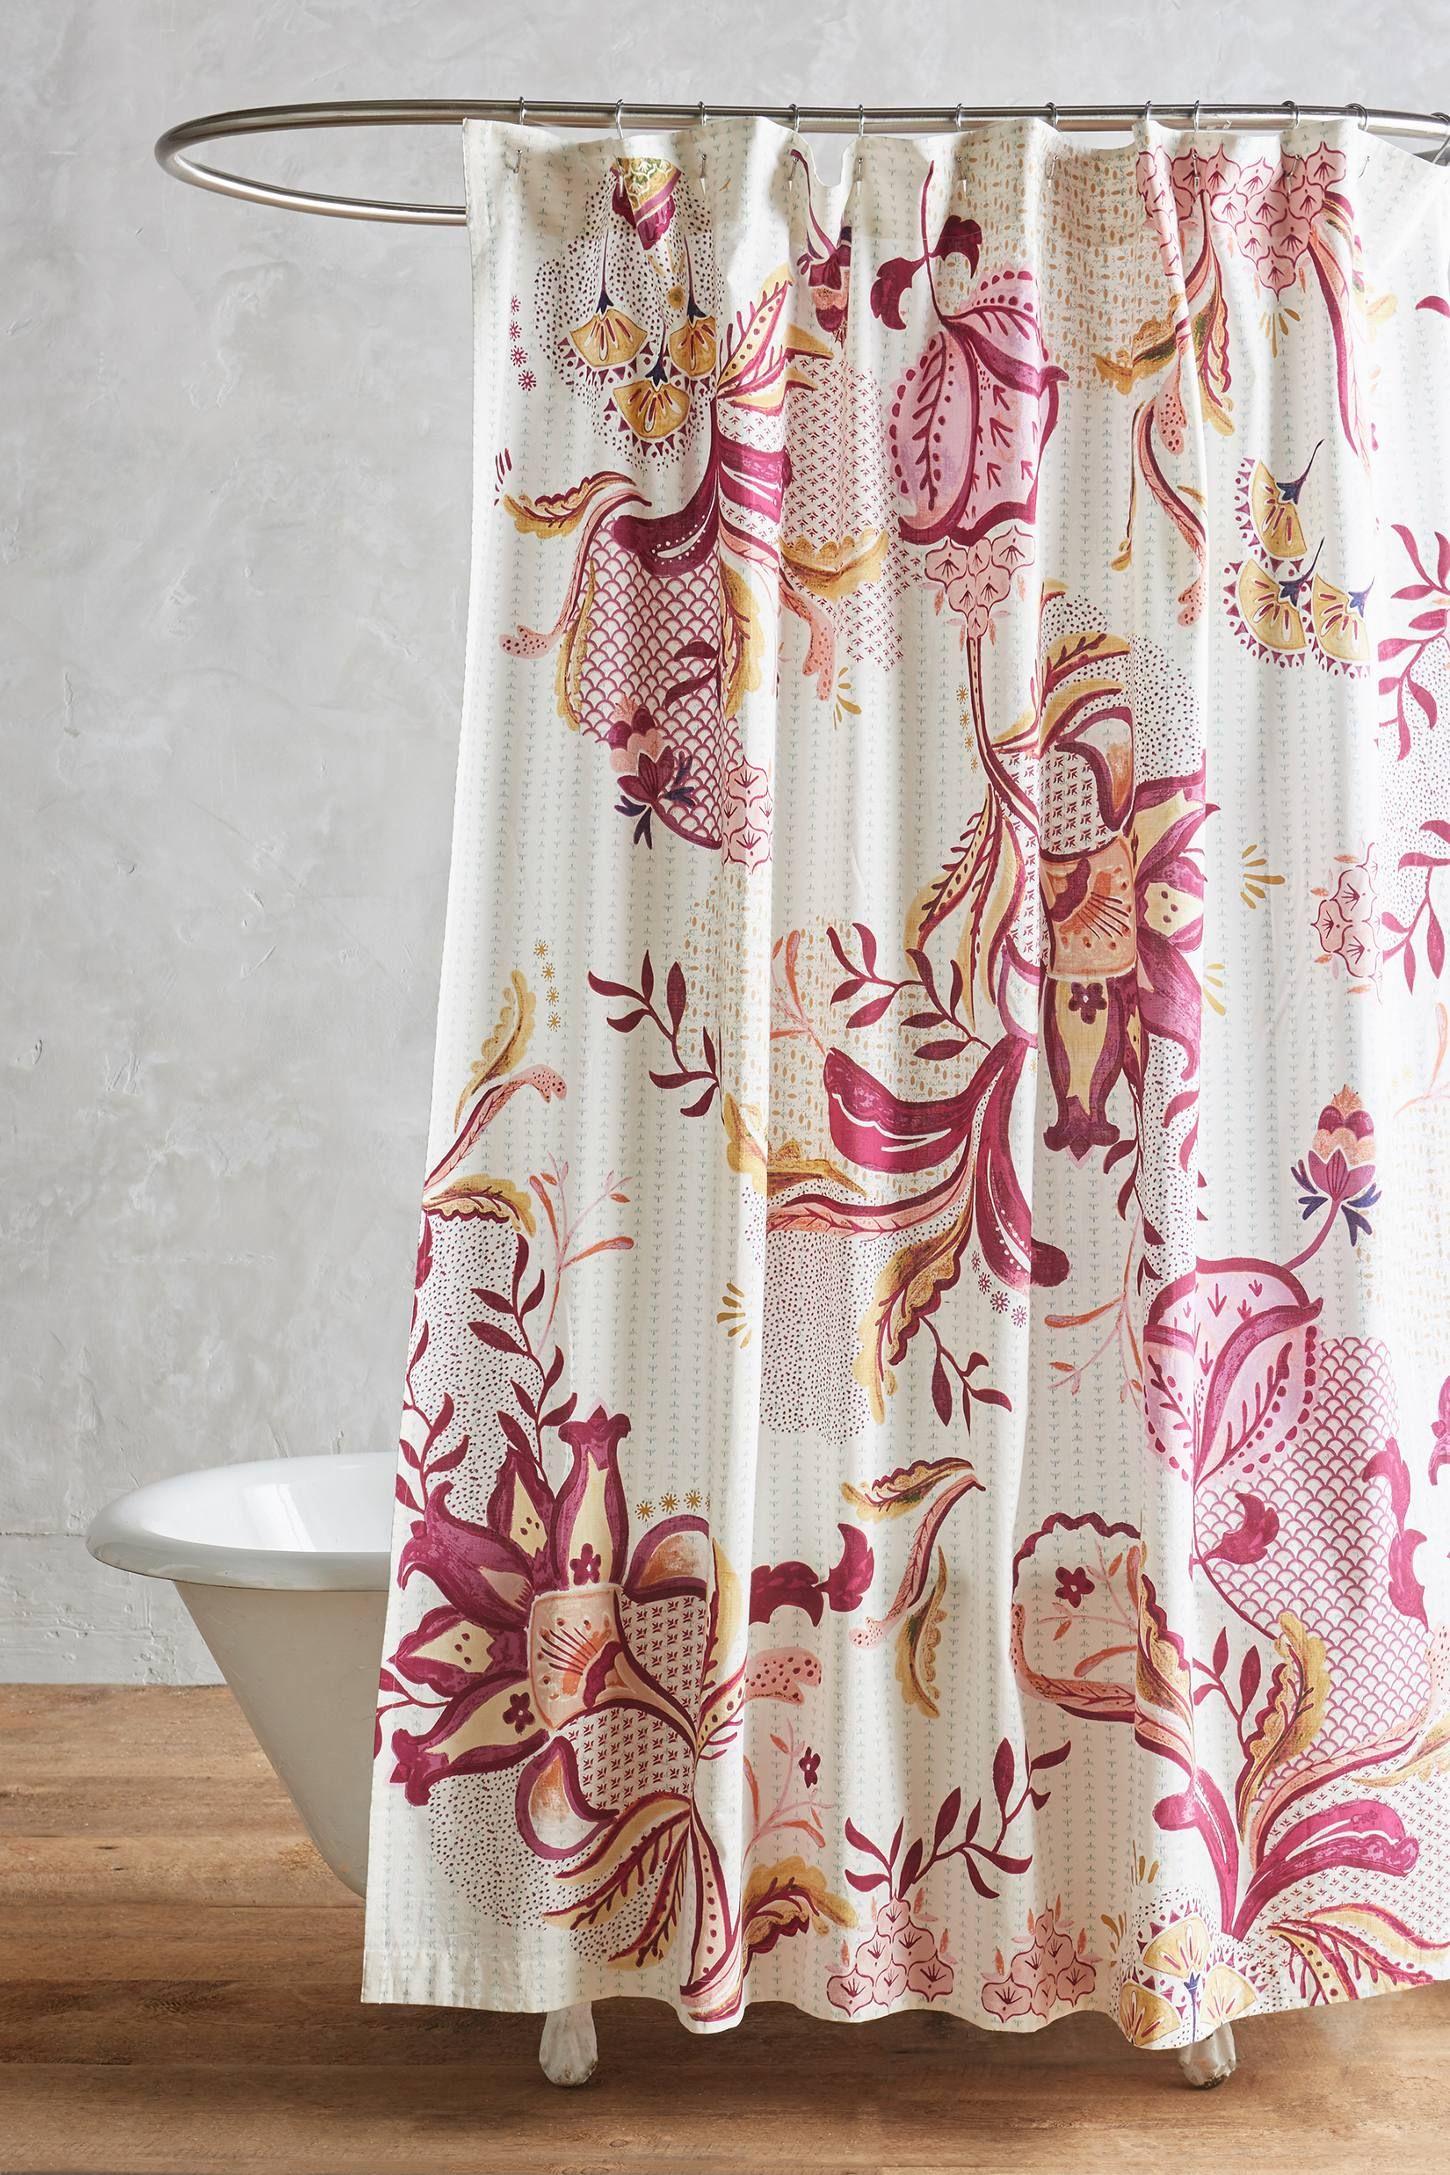 Shower curtain liner apartment ideas bathroom accessories and condos